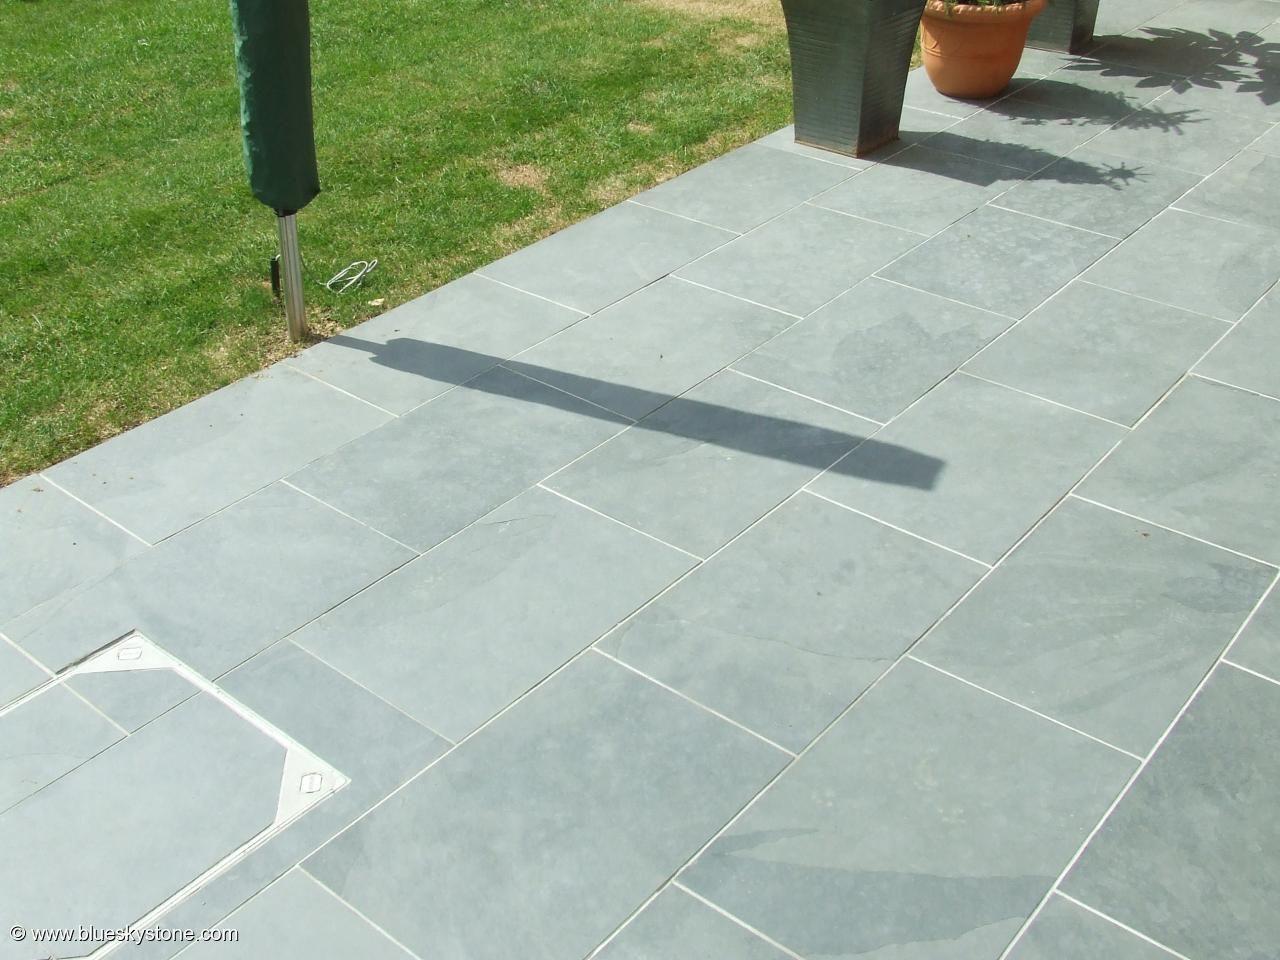 Grey Blue Brazilian Slate Paving Patio Garden Slabs Tiles - Images ...